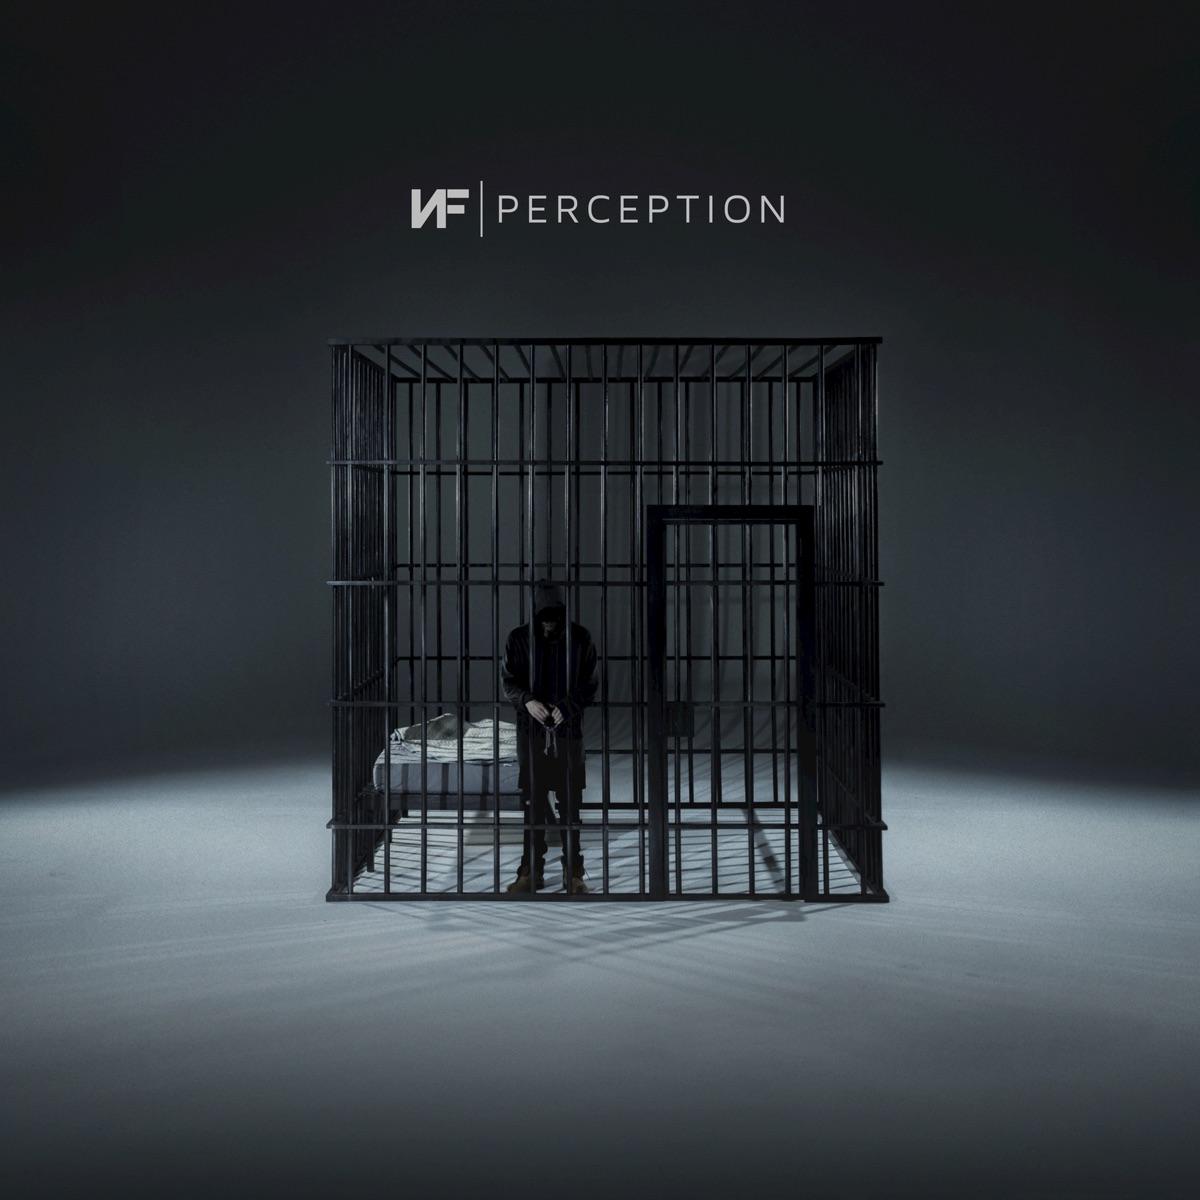 Perception NF CD cover